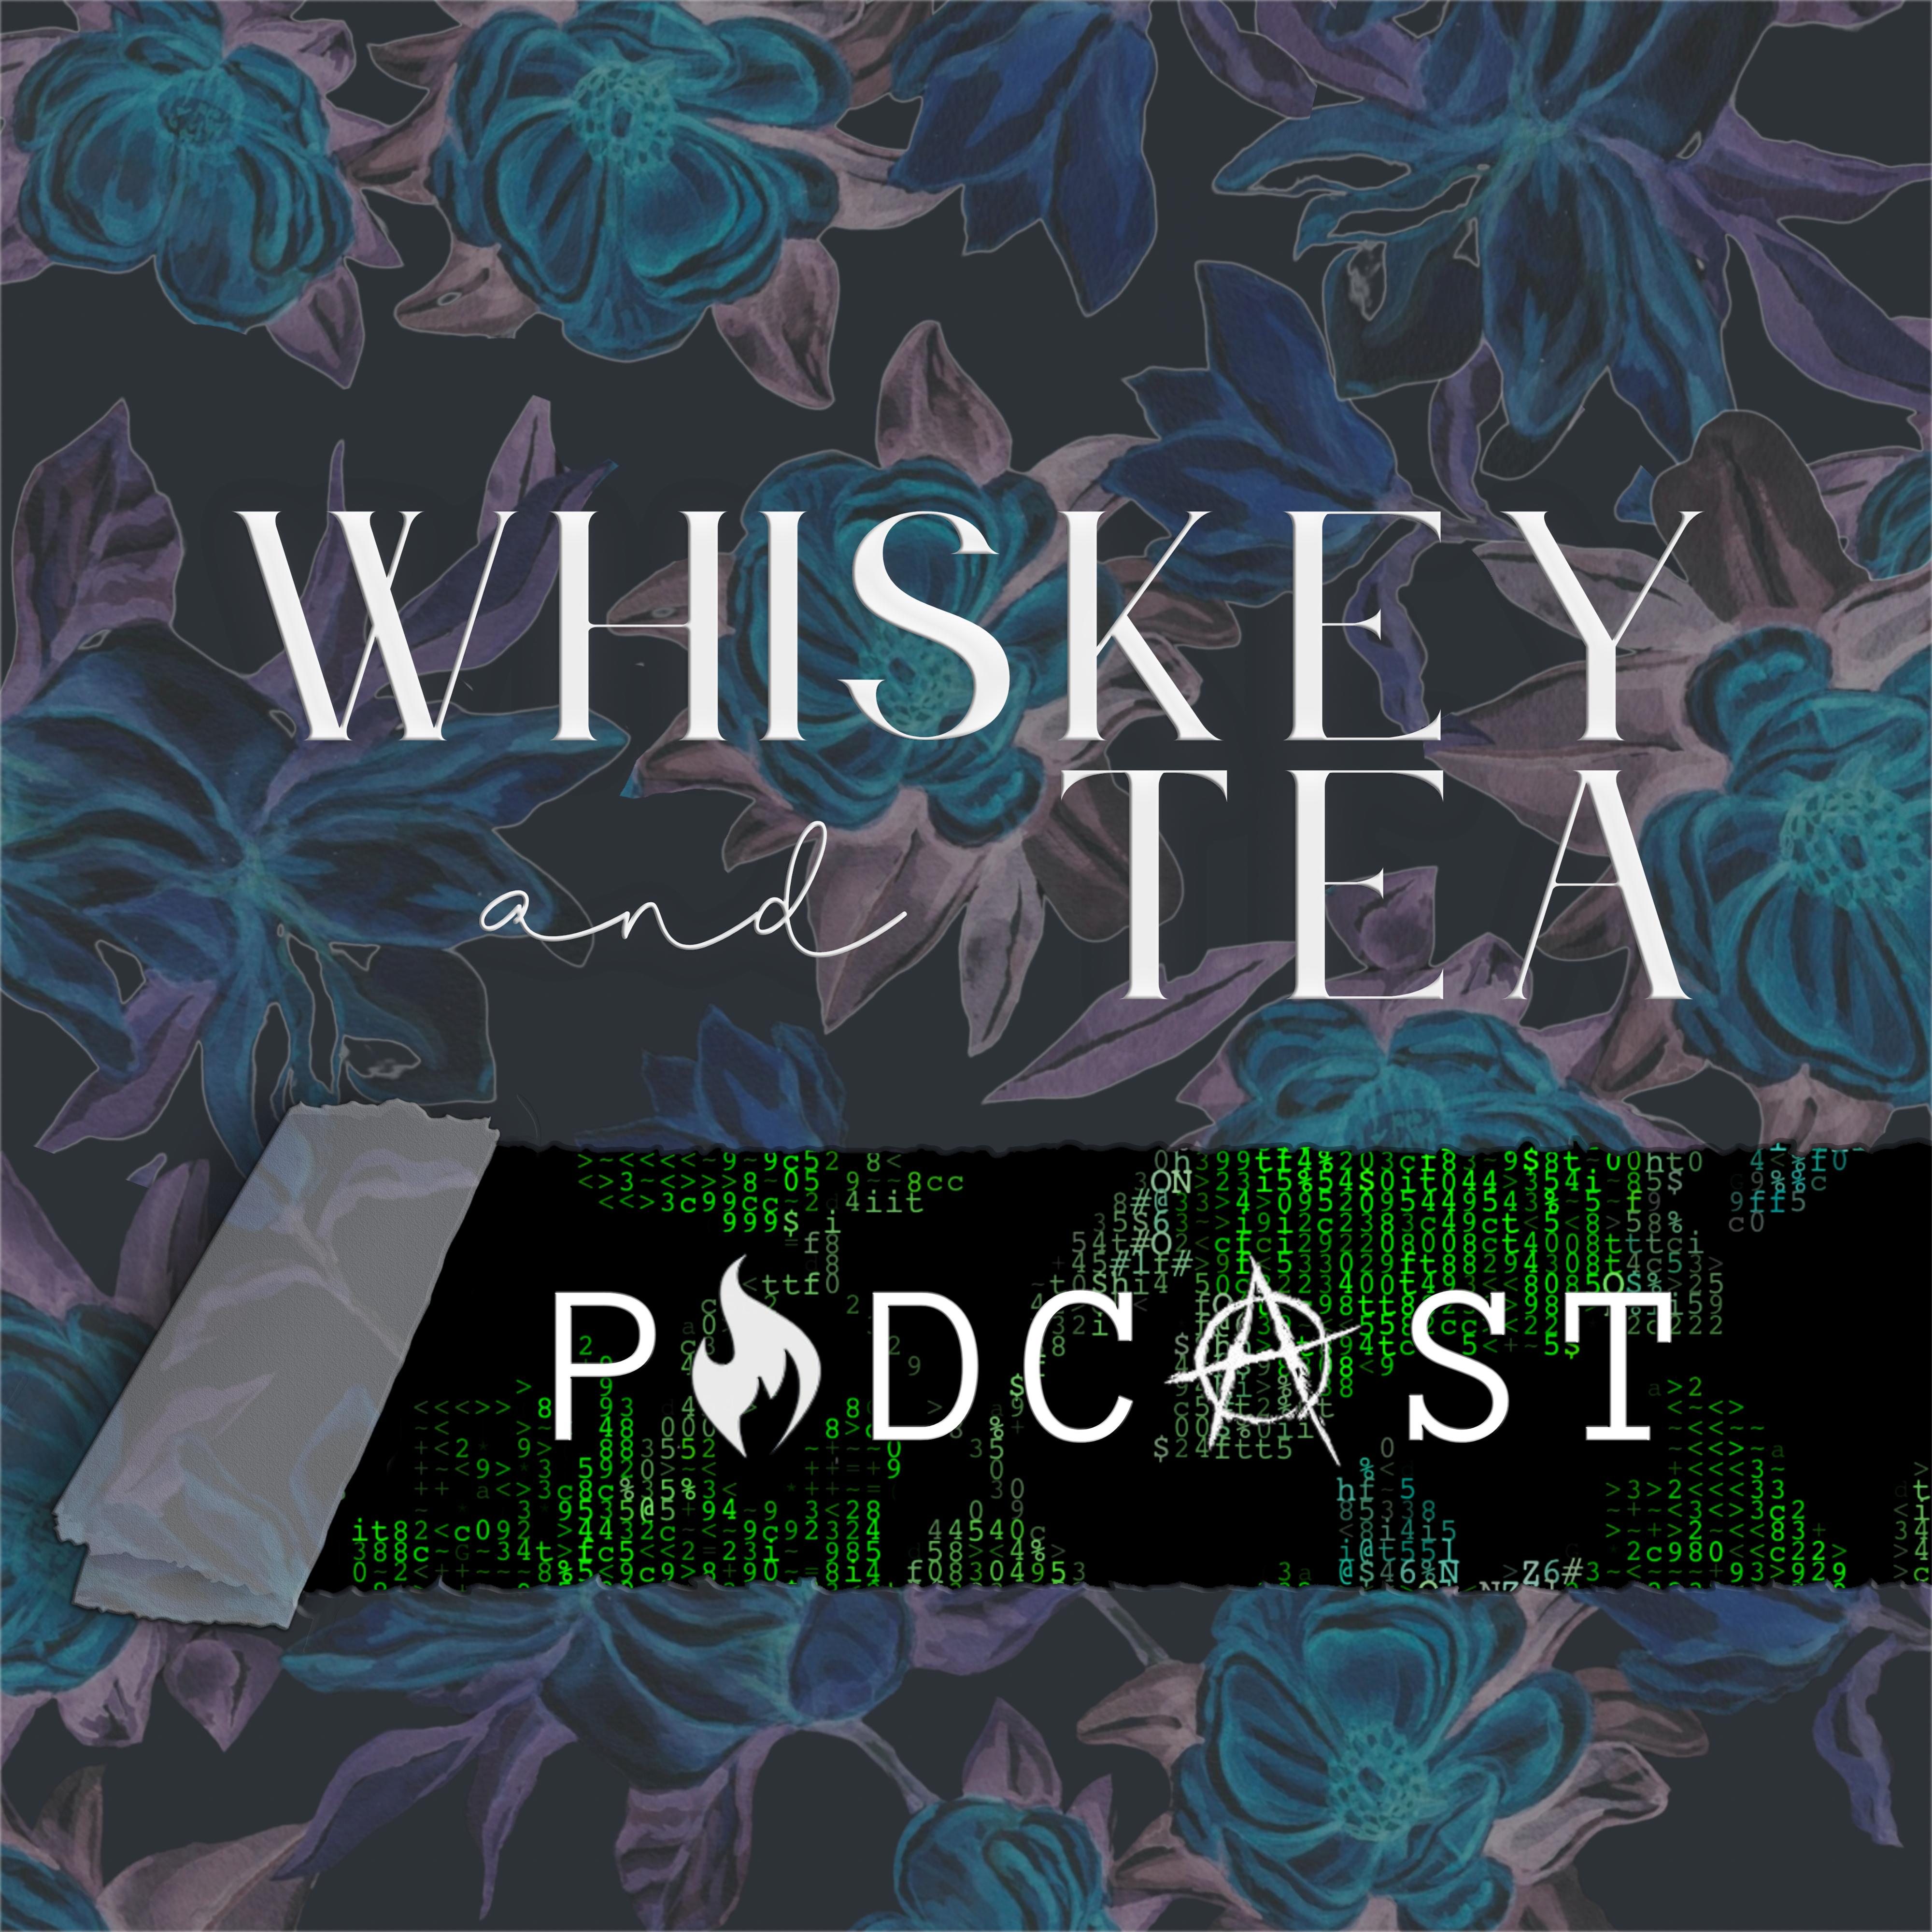 creative artistic custom logo whiskey tea podcast political flowers matrix anarchy